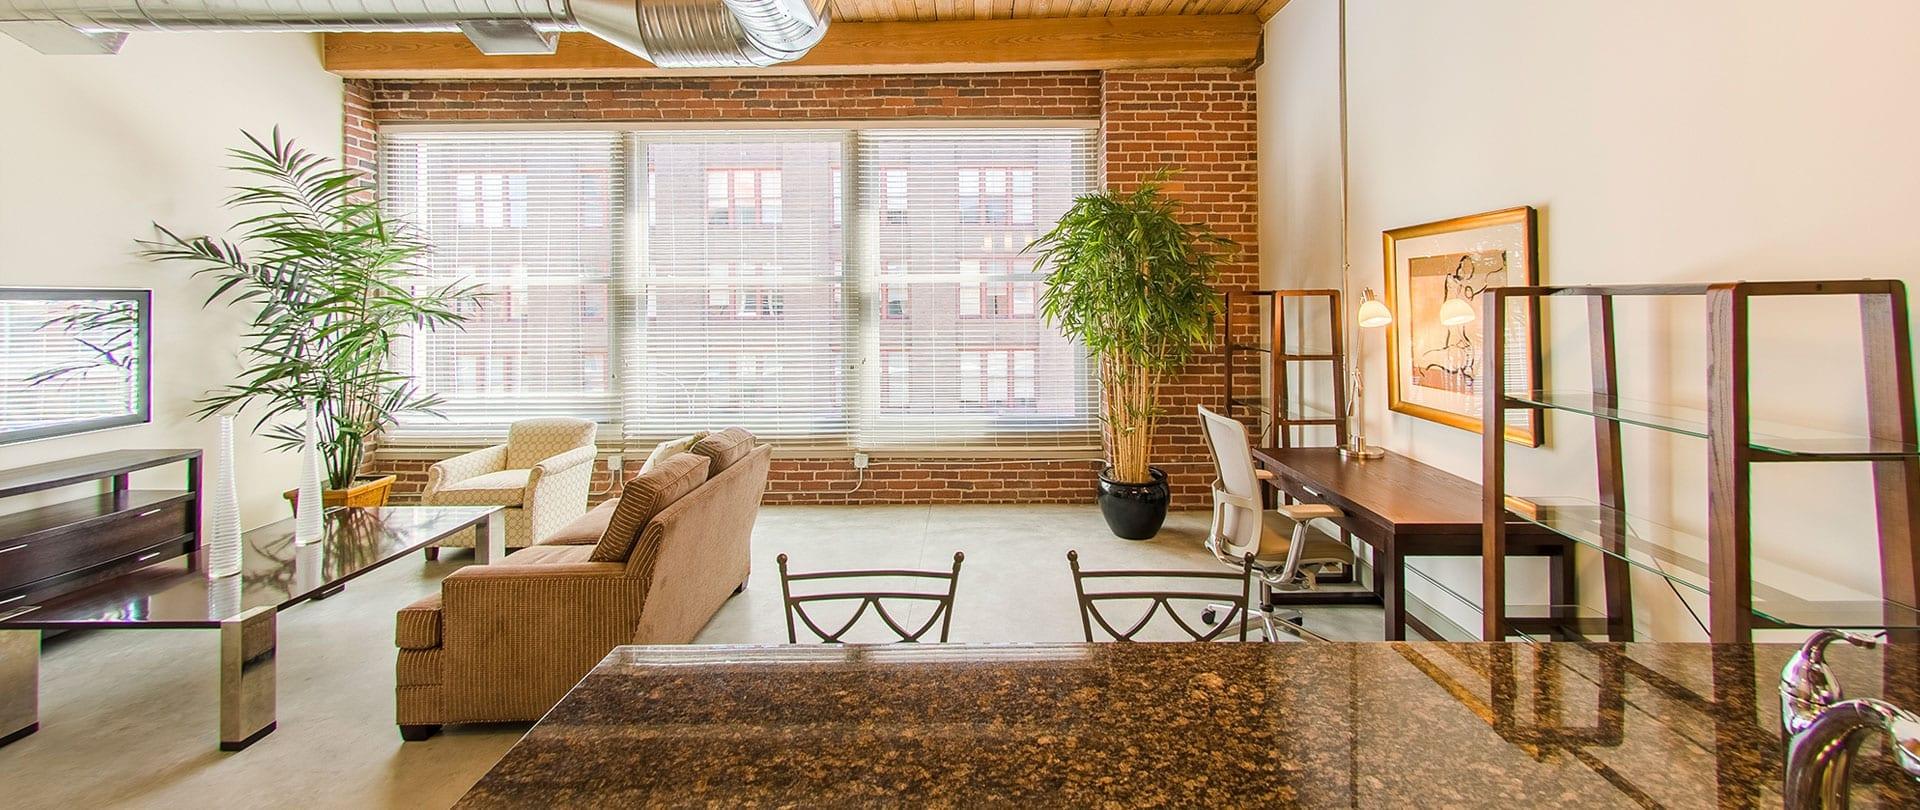 Butler Brothers Lofts Lofts Condos And Apartments